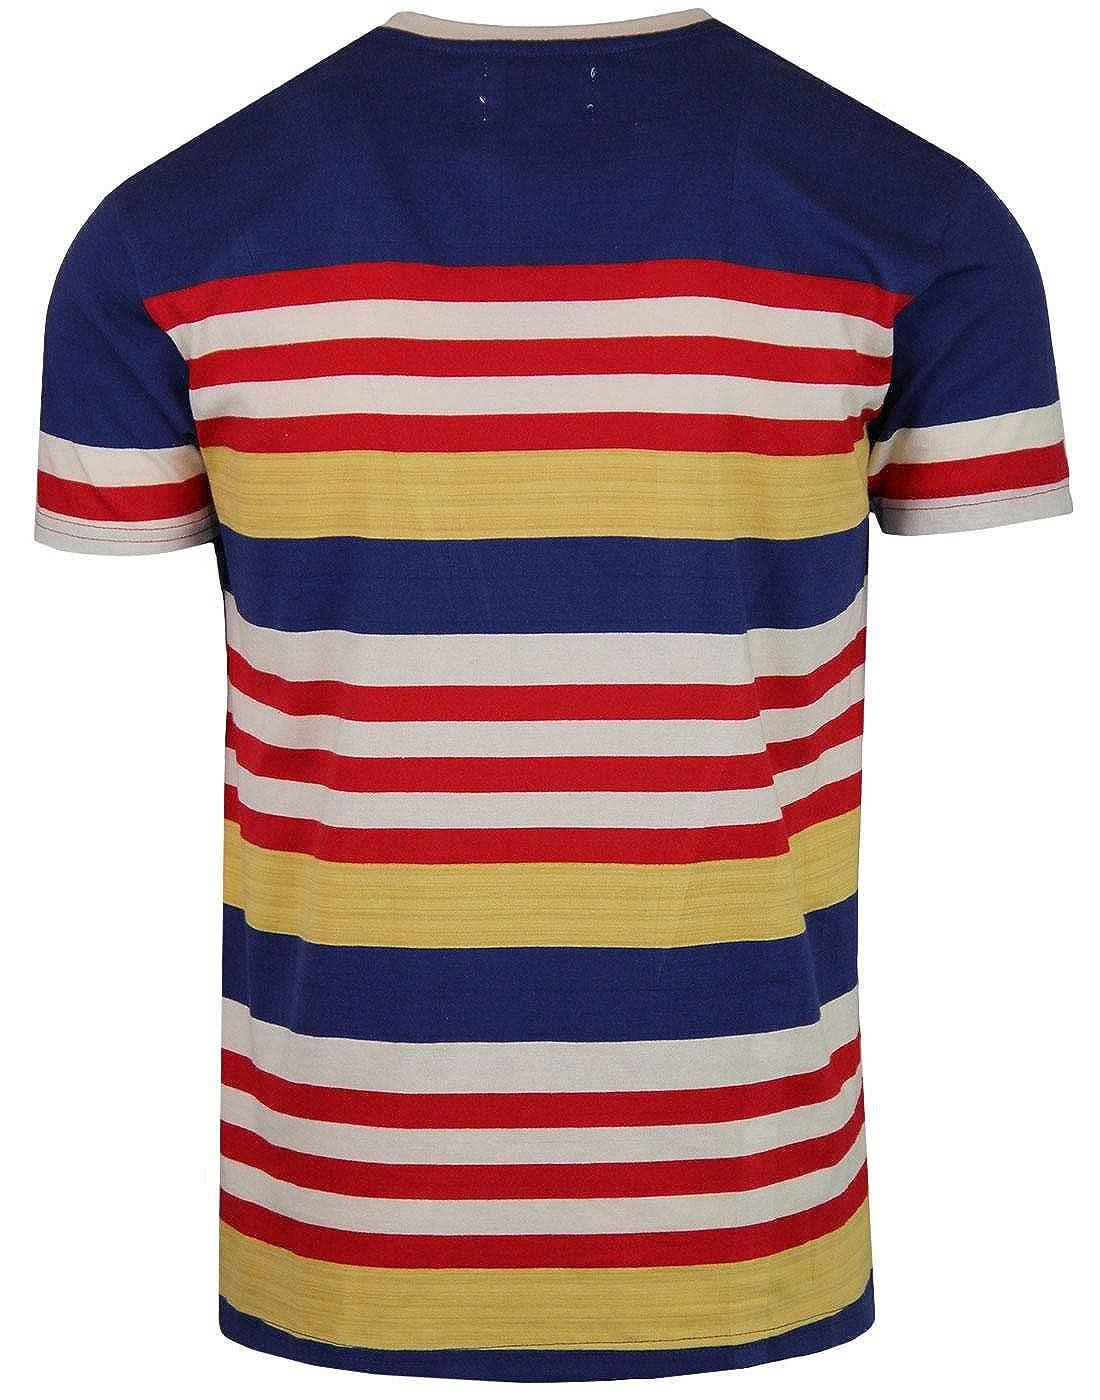 Madcap England - Camiseta - Rayas - Manga Corta - Hombre Azul Azul ...